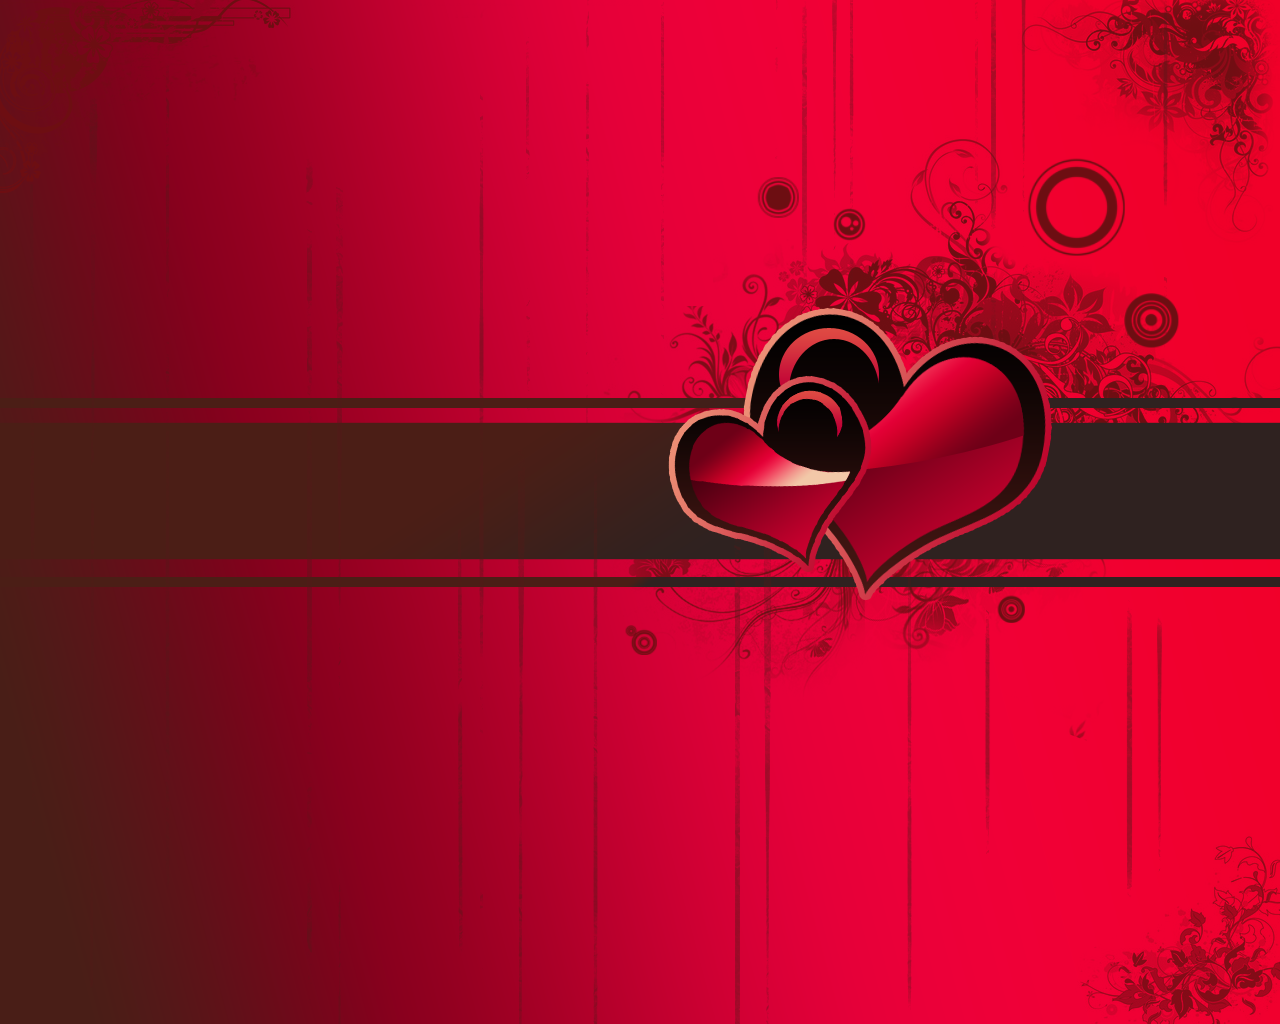 30 heart inspired wallpapers for valentines - San valentin desktop backgrounds ...